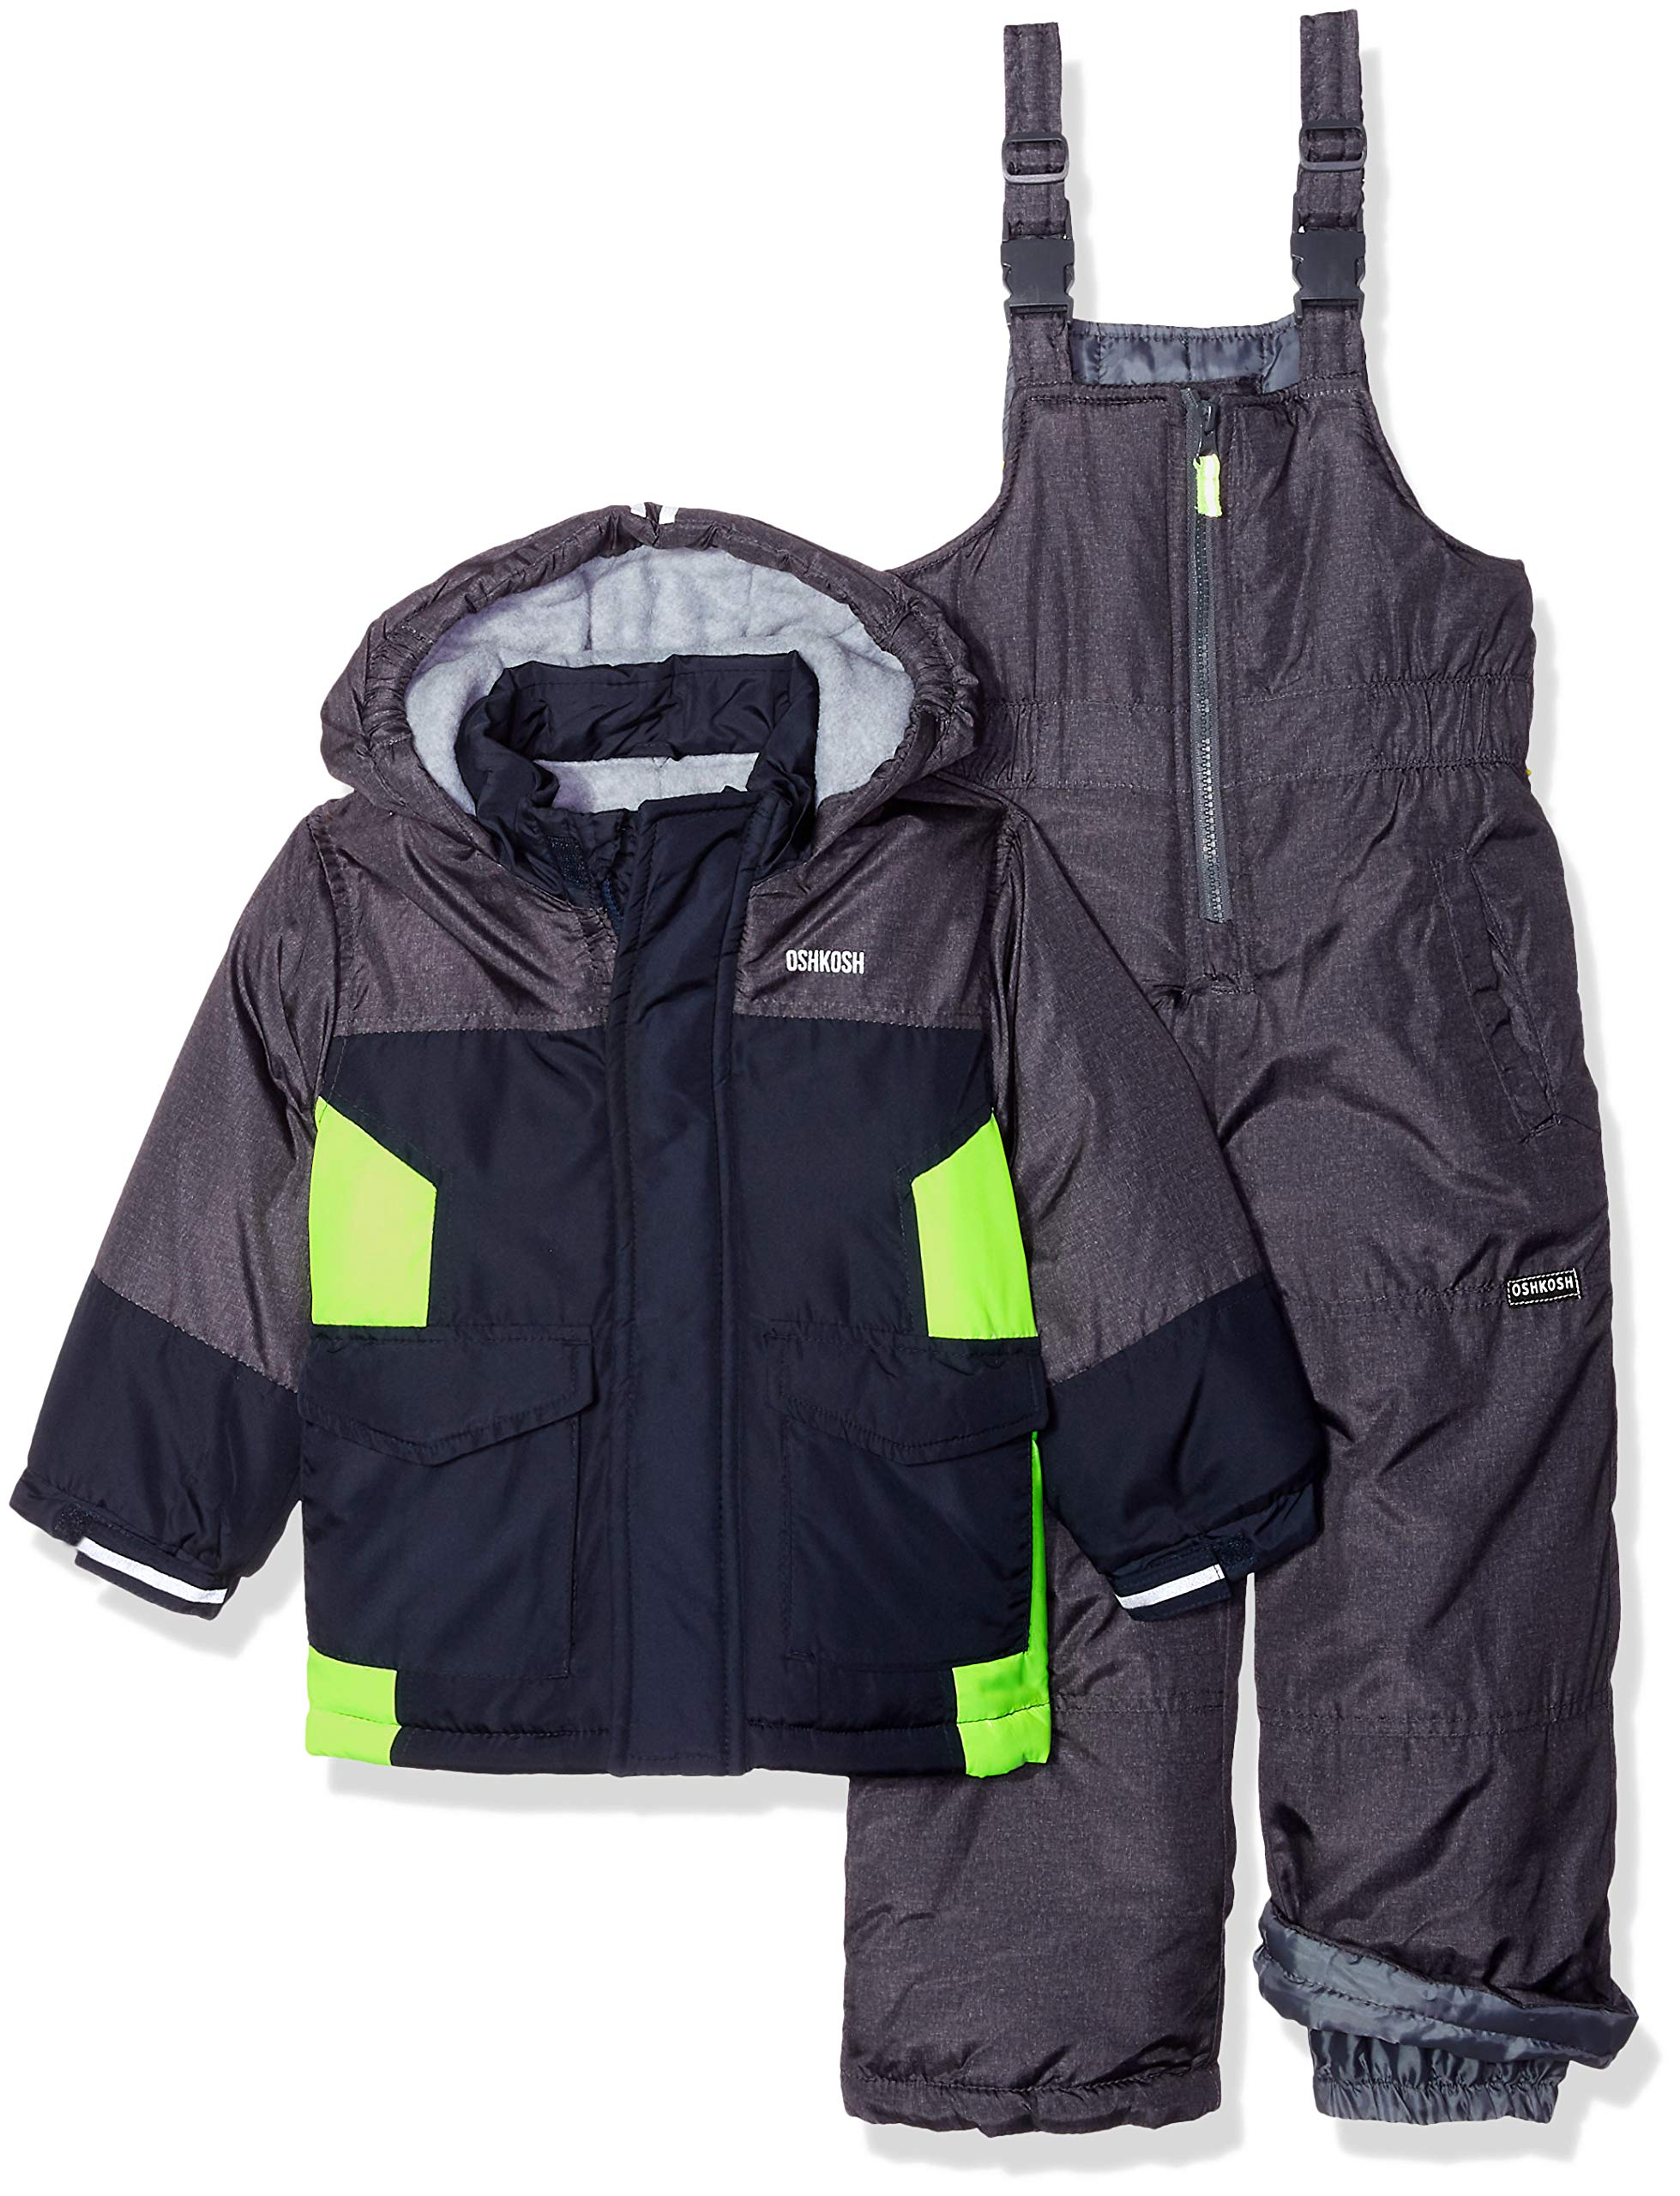 e533911c33dd Galleon - OshKosh B Gosh Boys  Toddler Ski Jacket And Snowbib ...